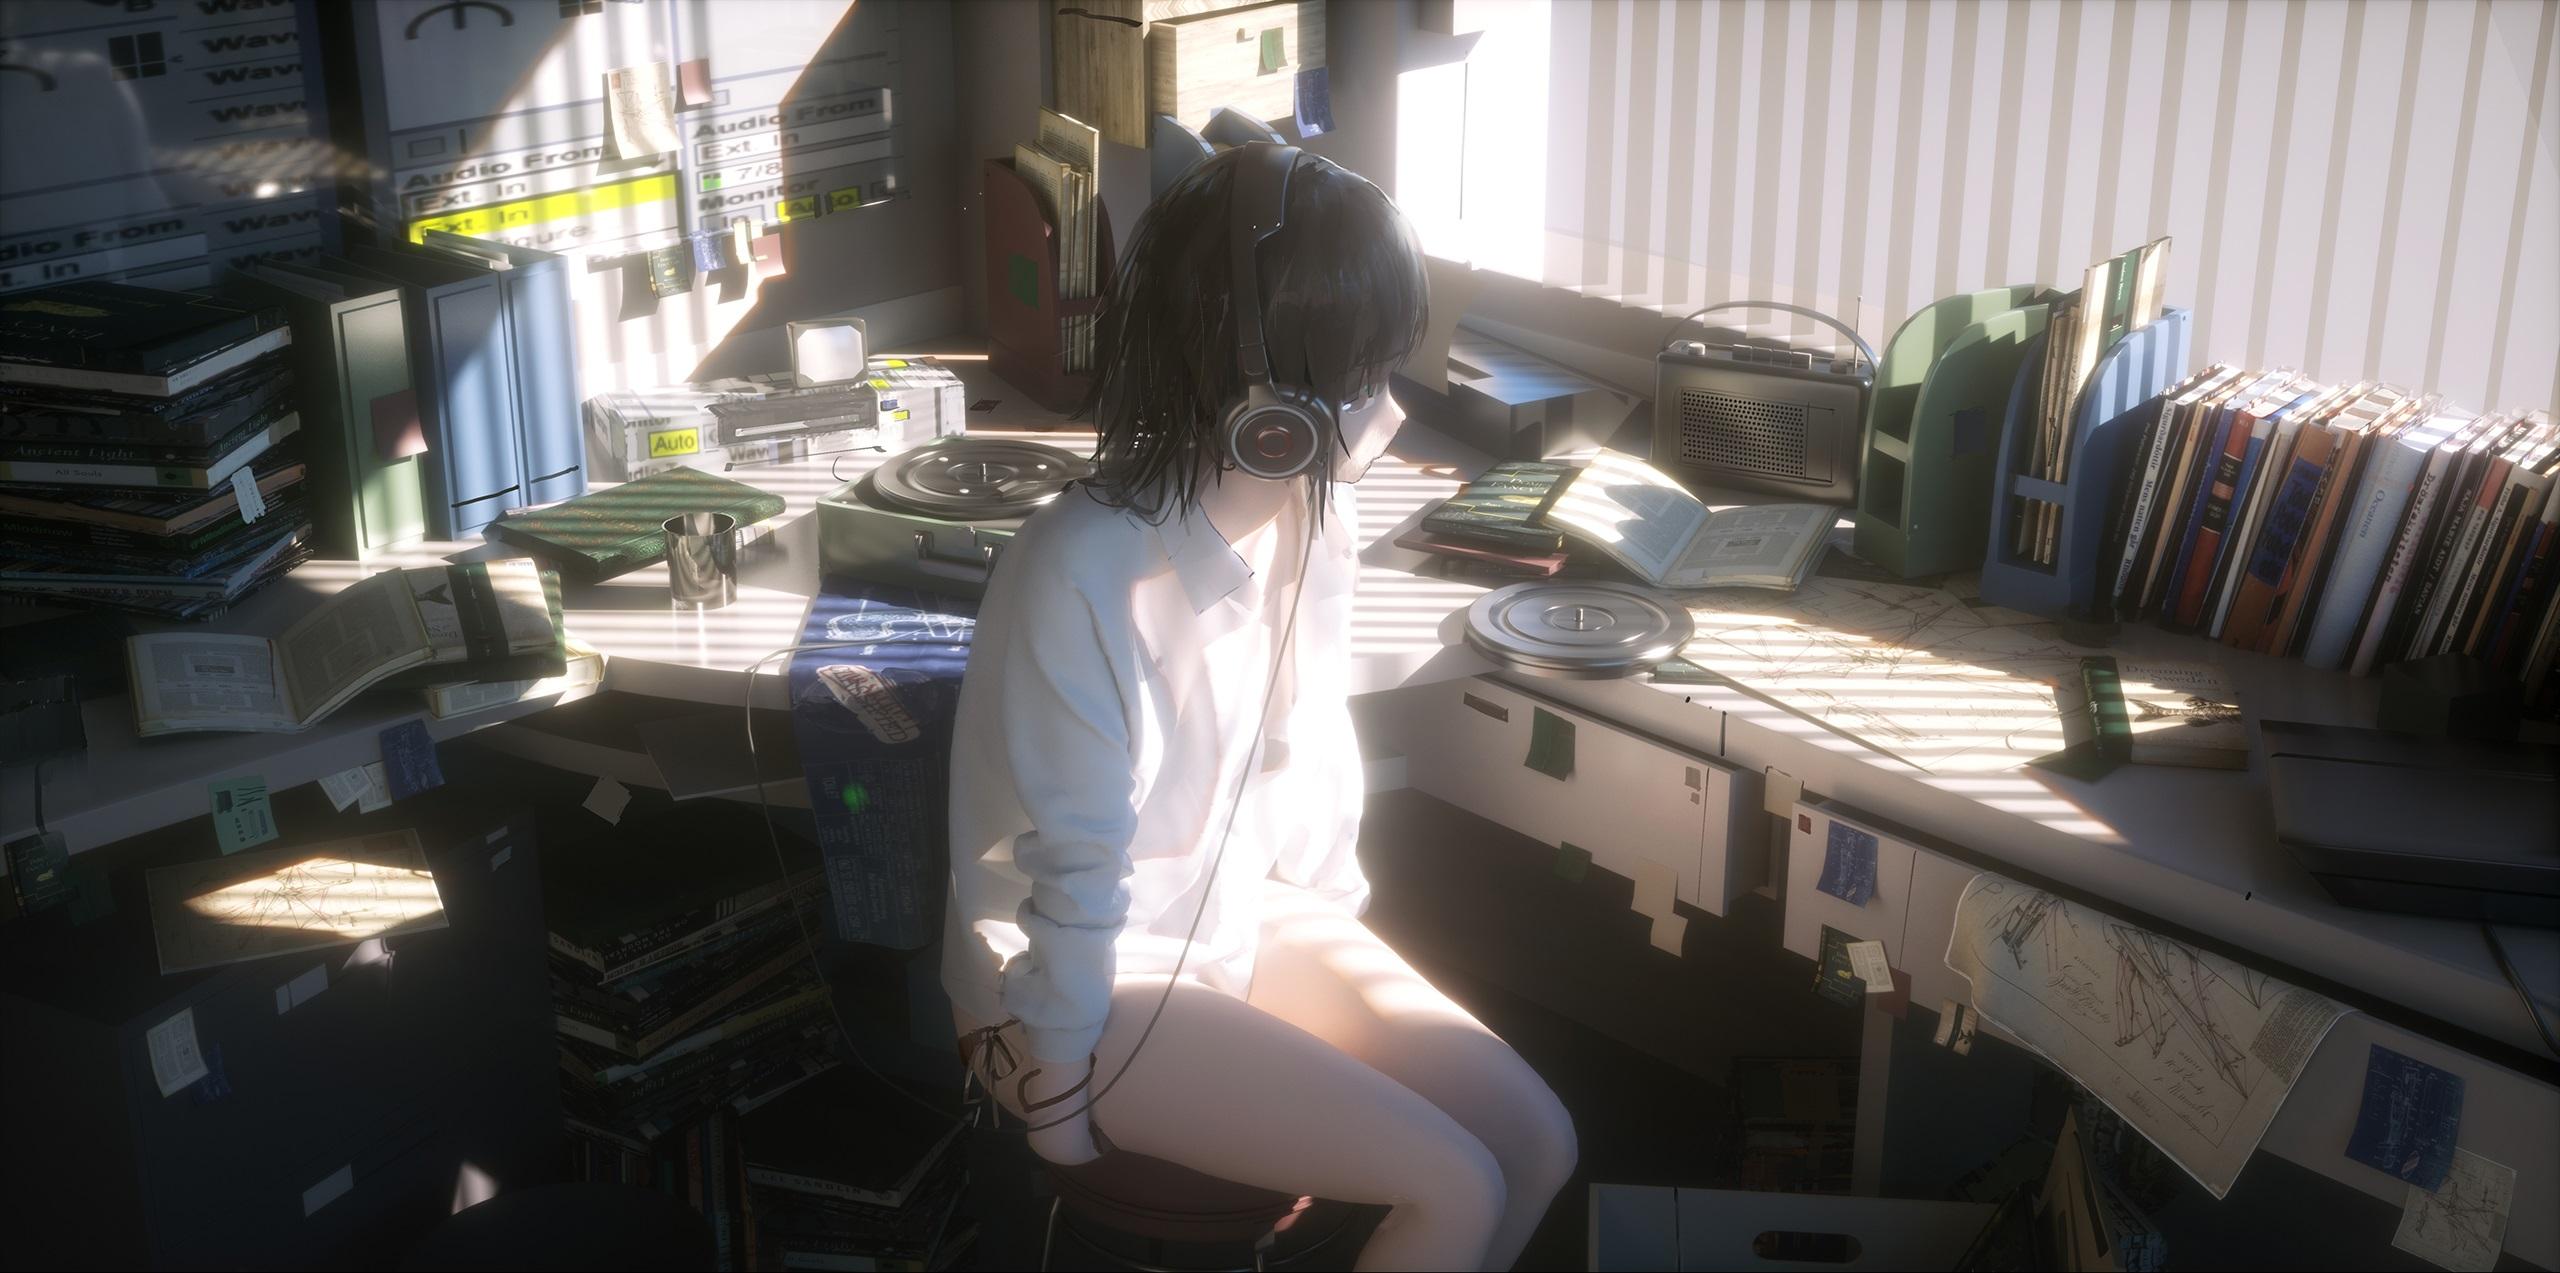 Anime 2560x1273 anime girls headphones women indoors desk radio books window